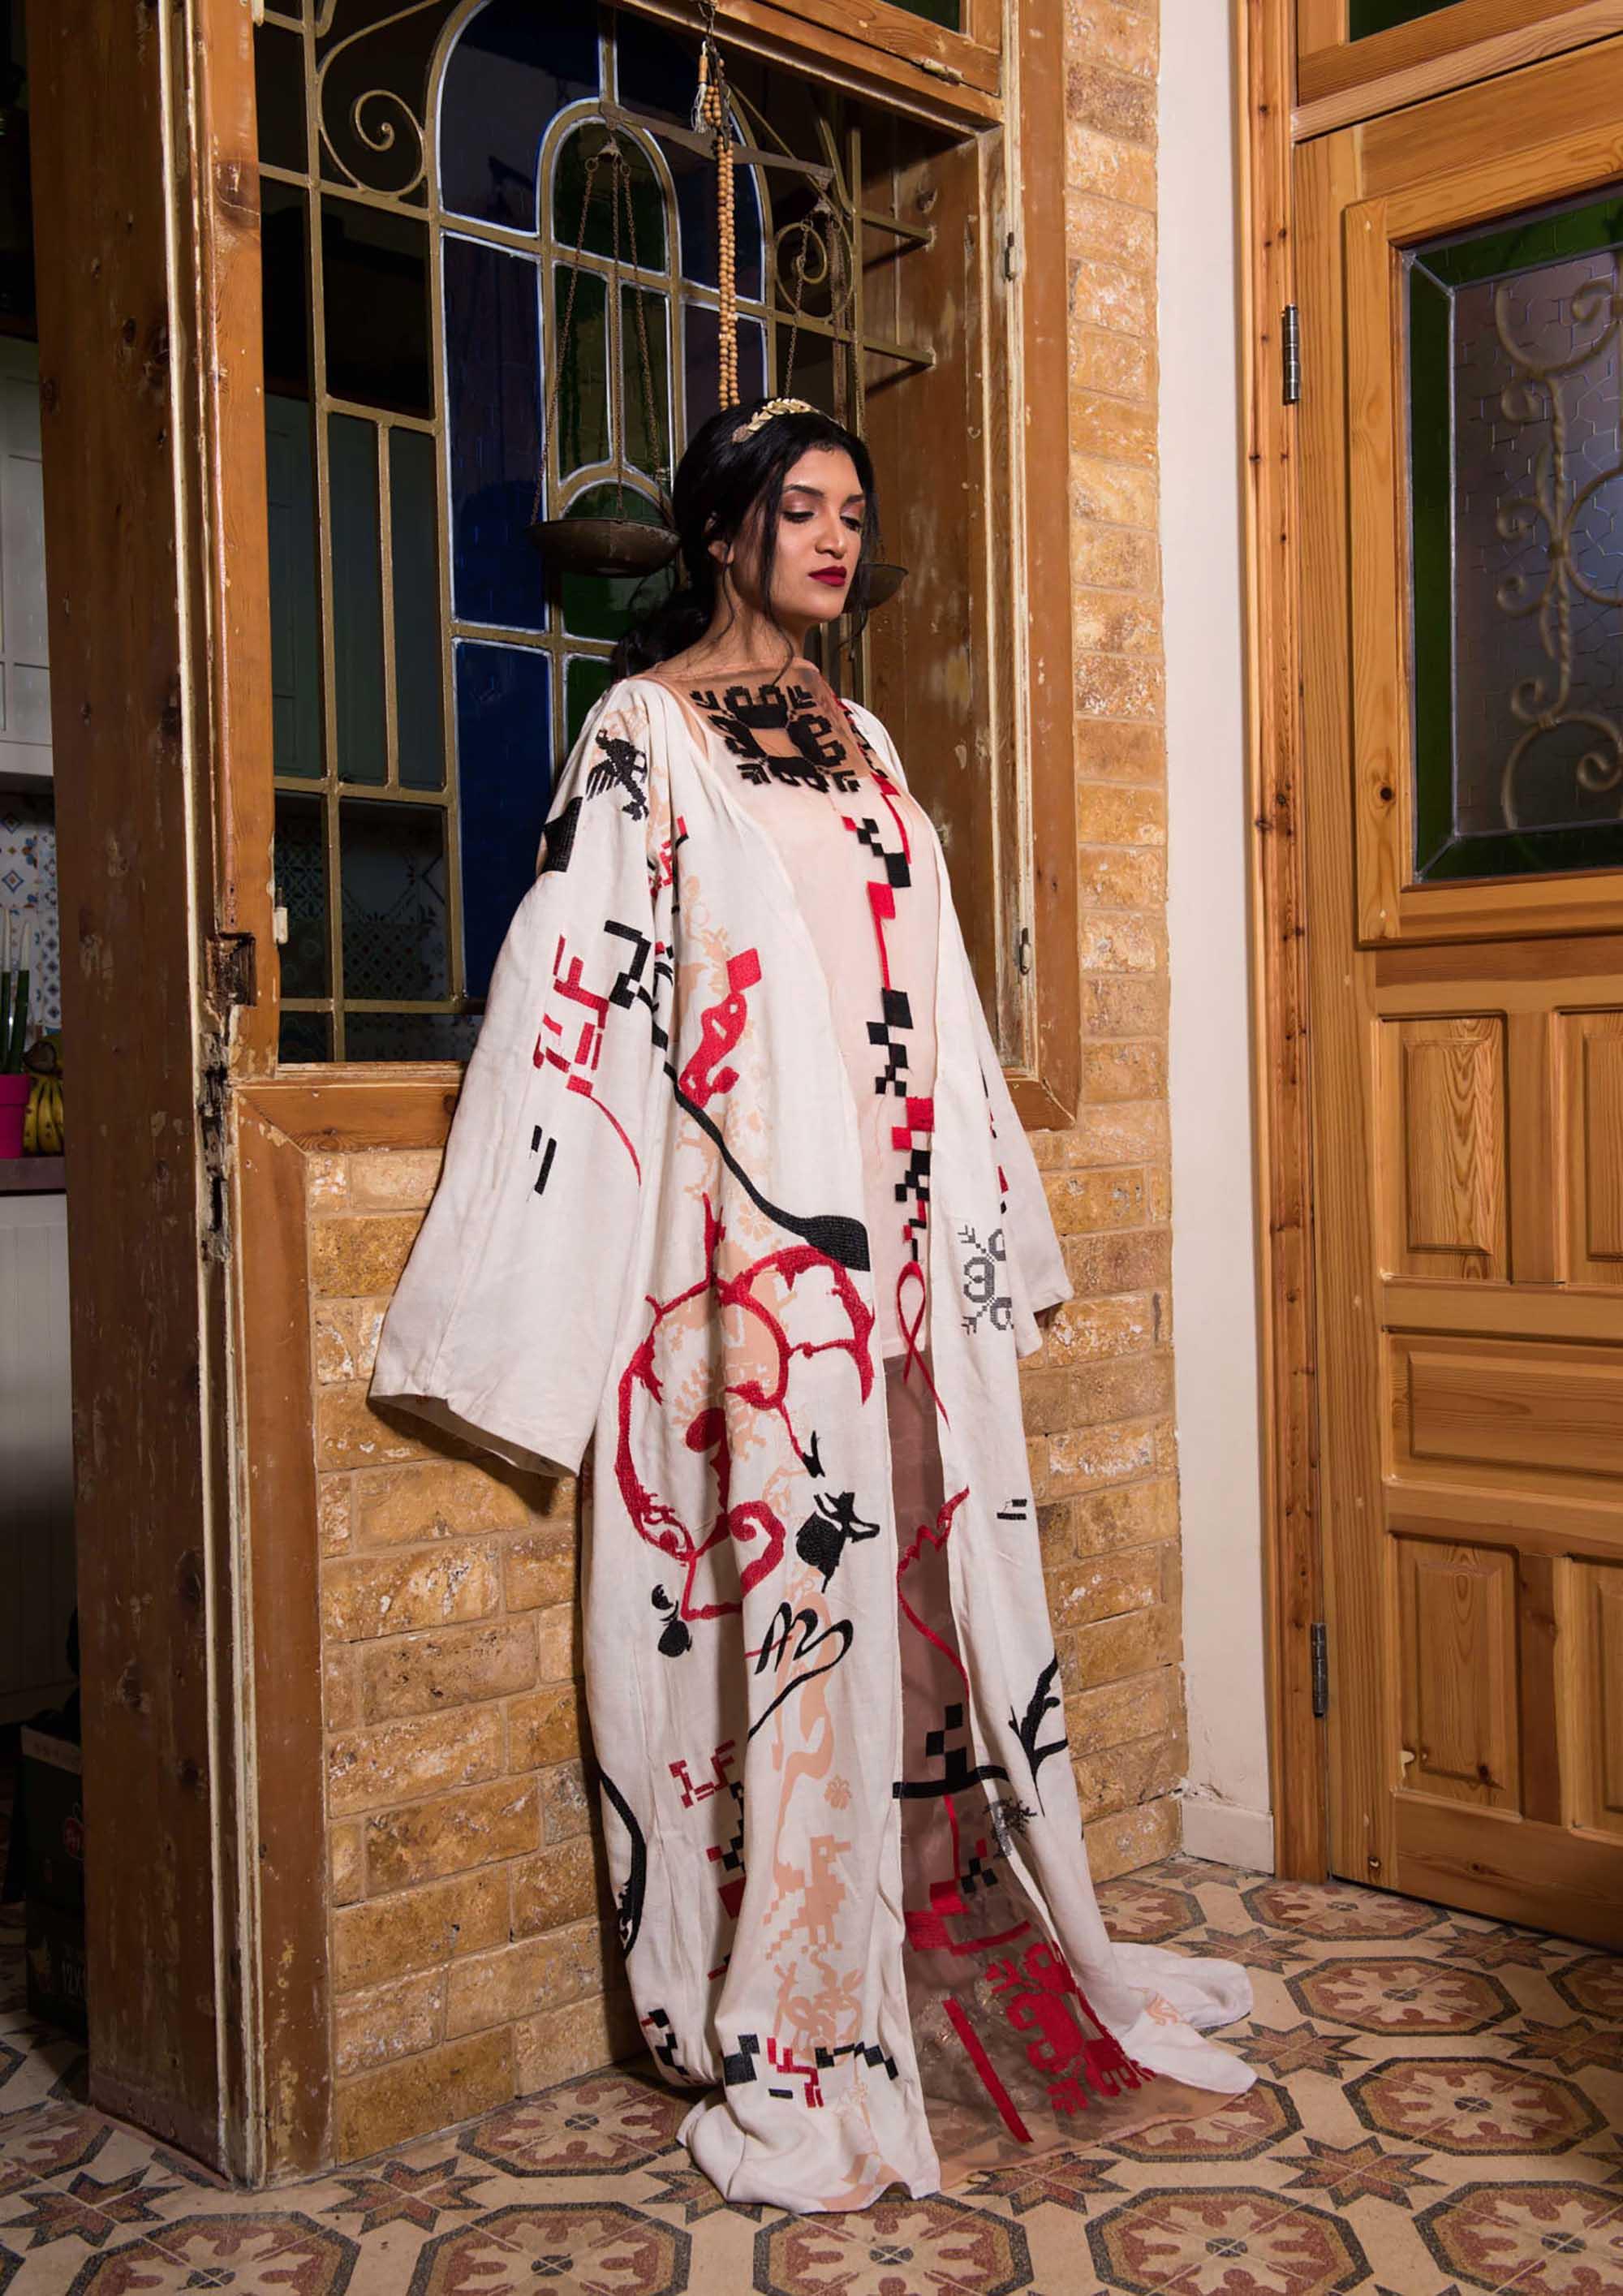 Fashion Israel, חדשות אופנה, כתבות אופנה, טרנדים, מגזין אופנה, אופנה, צילום: מני פל, דוגמנית וסטיילינג: חדיג׳ה דסוקי, איפור: מריה מנצ'ב -